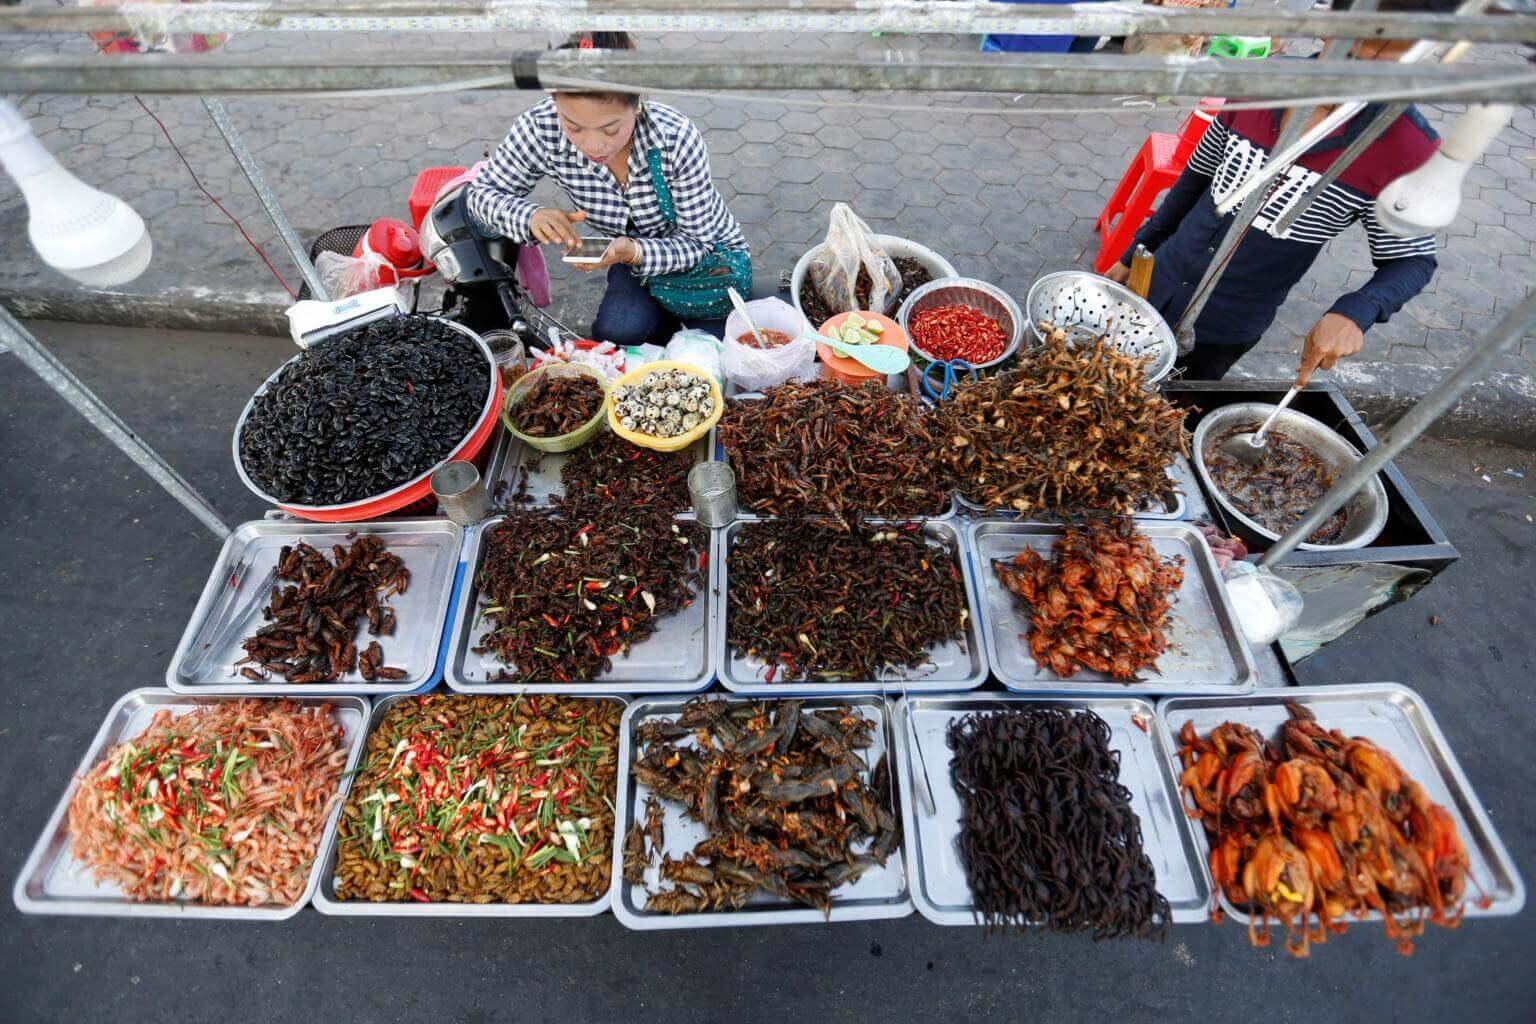 Thai delicacies in the food market